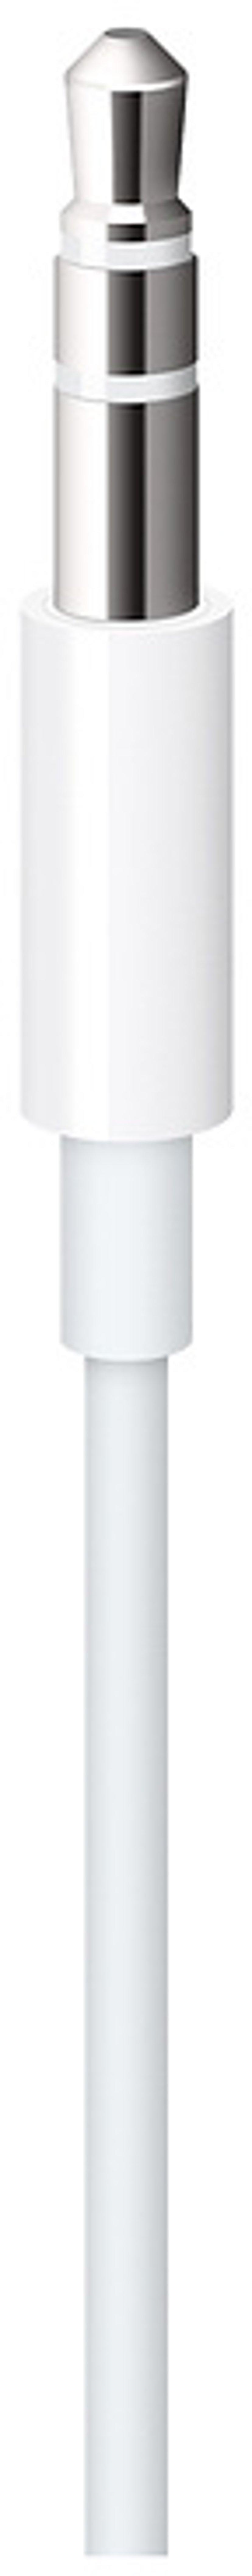 Apple Lightning to 3.5mm Audio Cable 1.2m Vit